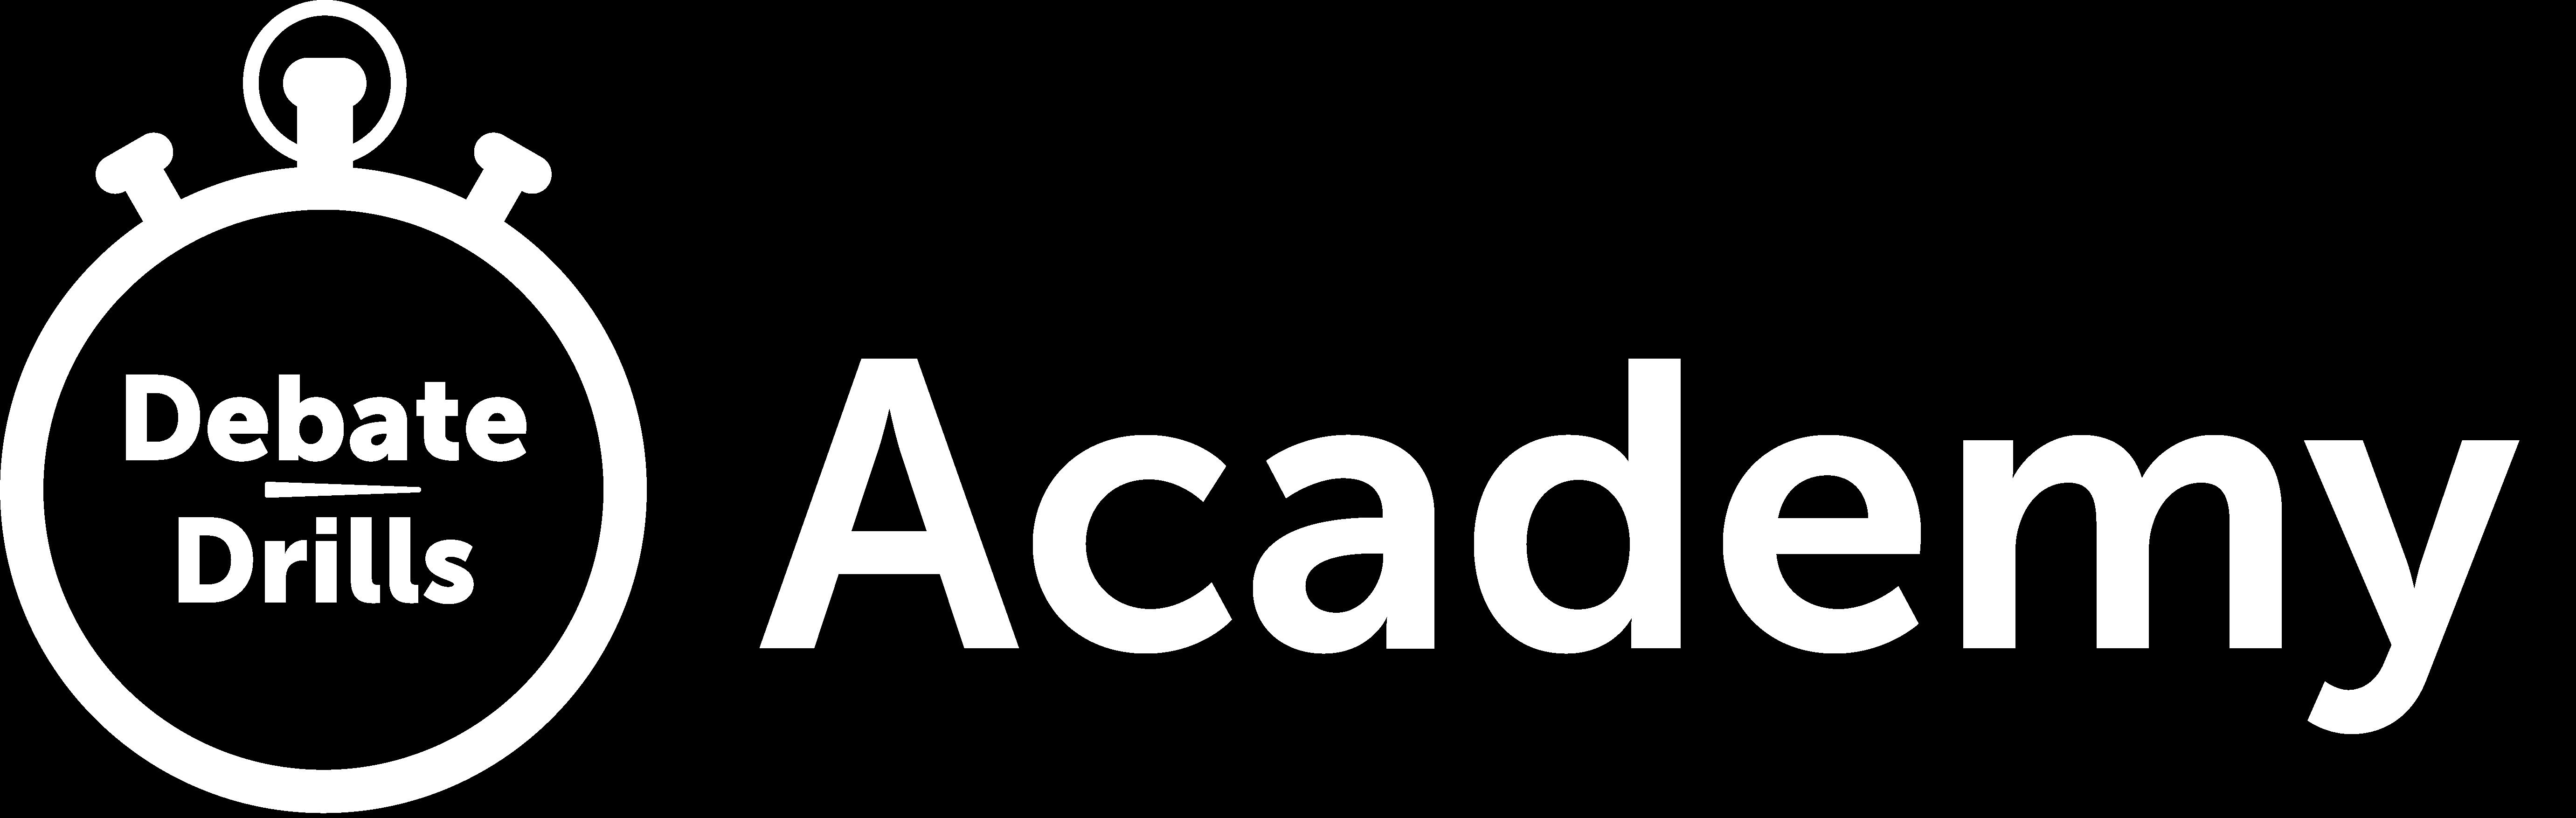 DebateDrills Academy Logo